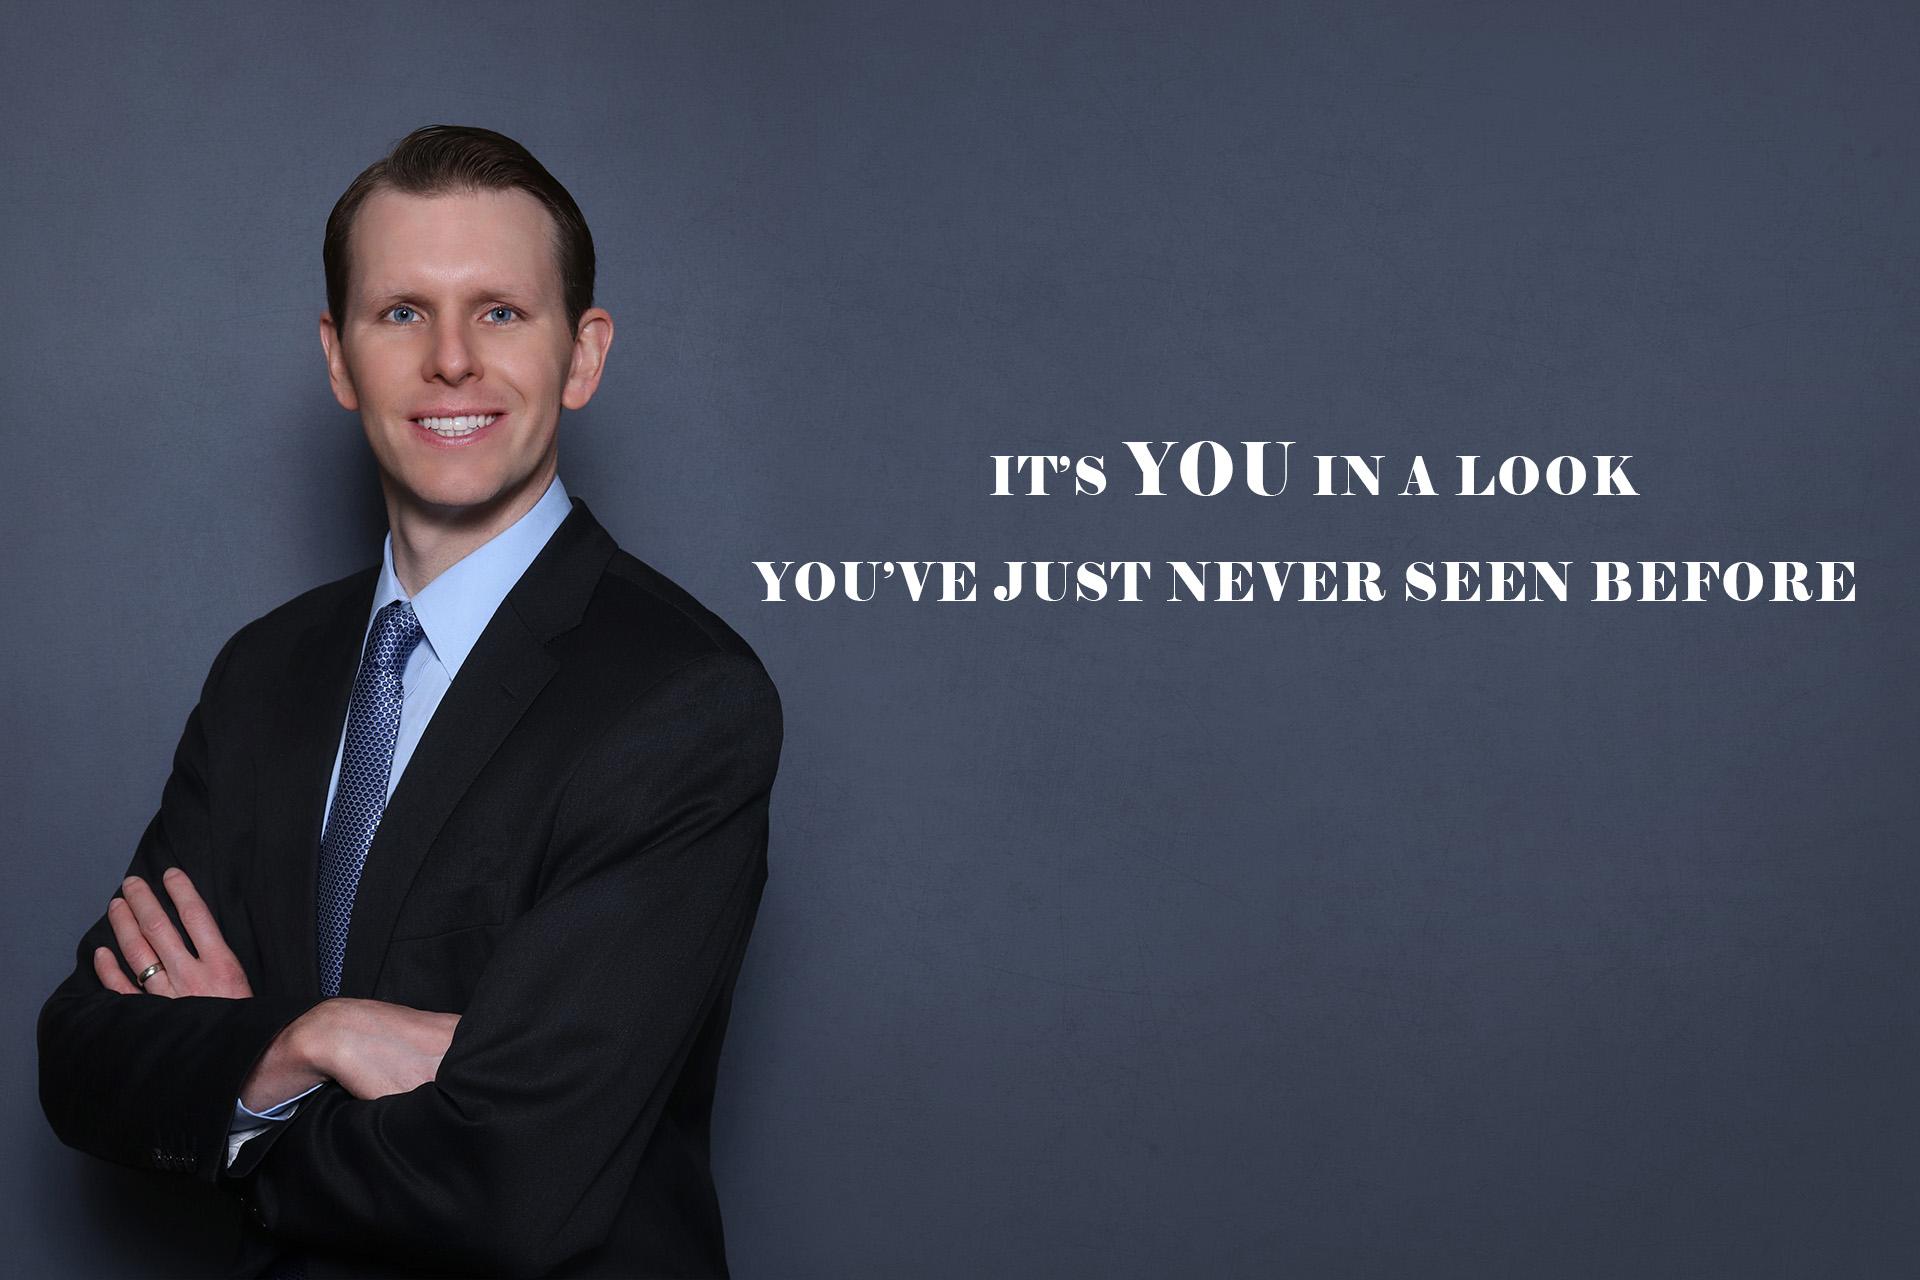 Houston Executive Professional Headshot photos